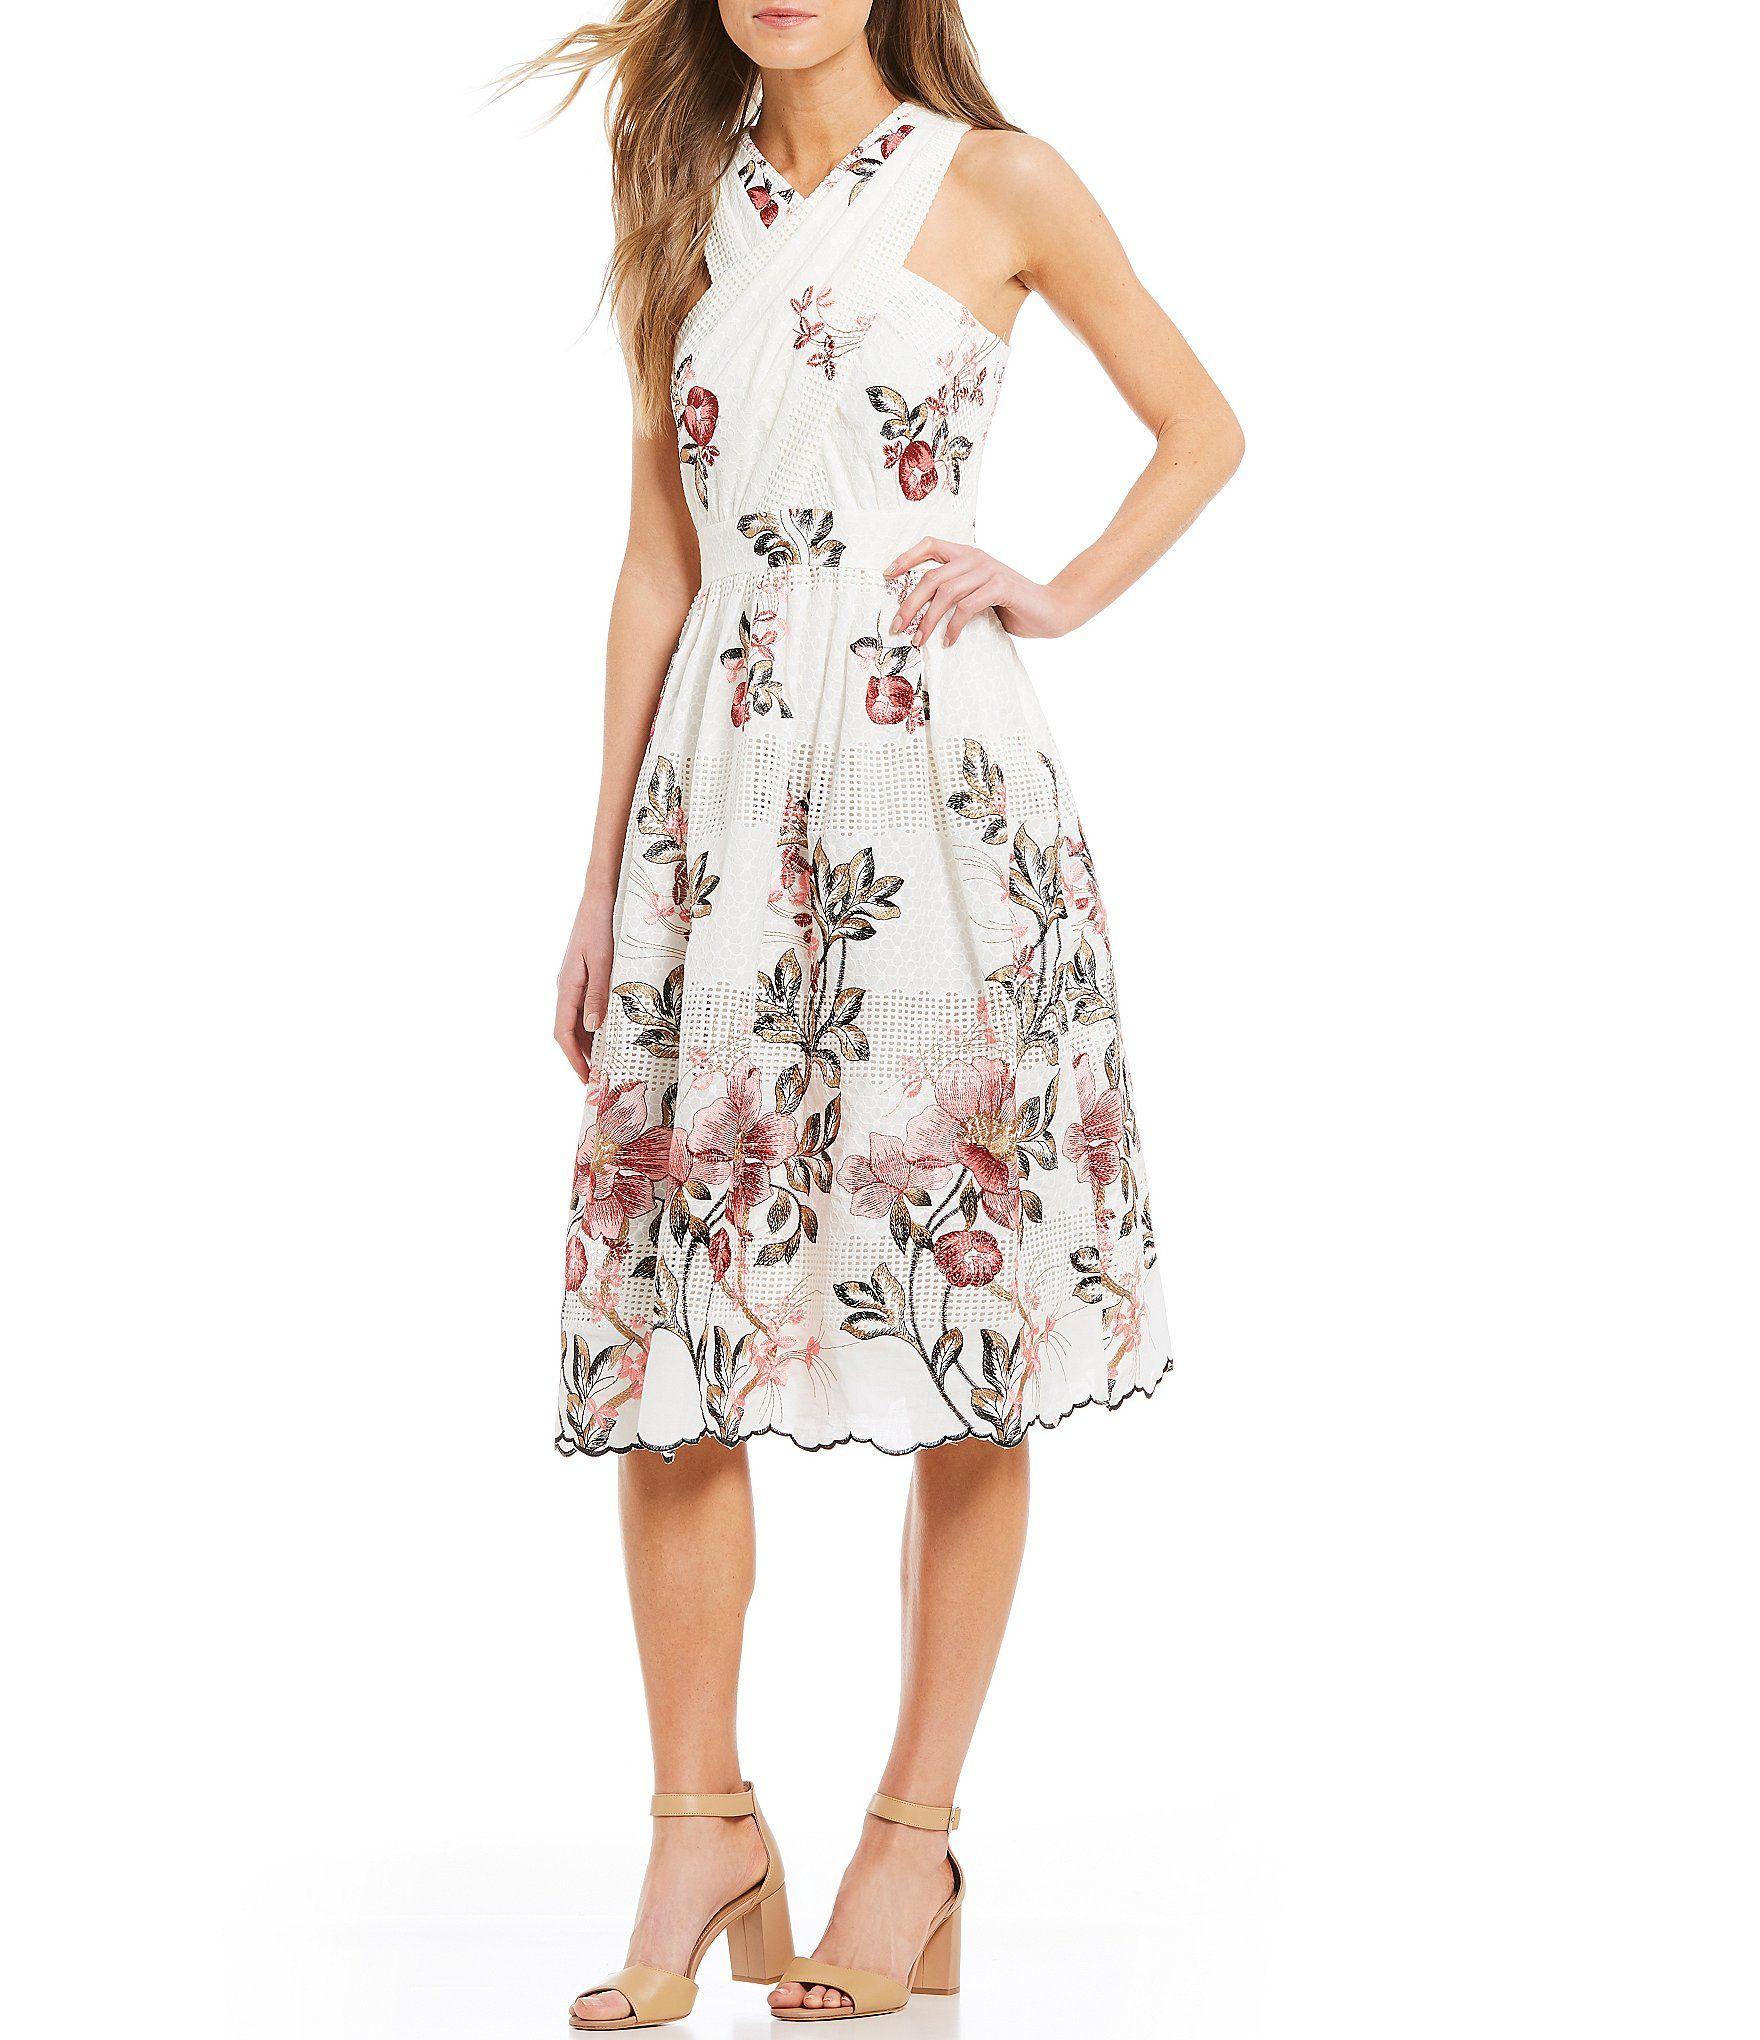 bc599d7b258 Shop for Antonio Melani Floss Floral Print Eyelet Cross Front Midi Dress at  Dillards.com. Visit Dillards.com to find clothing